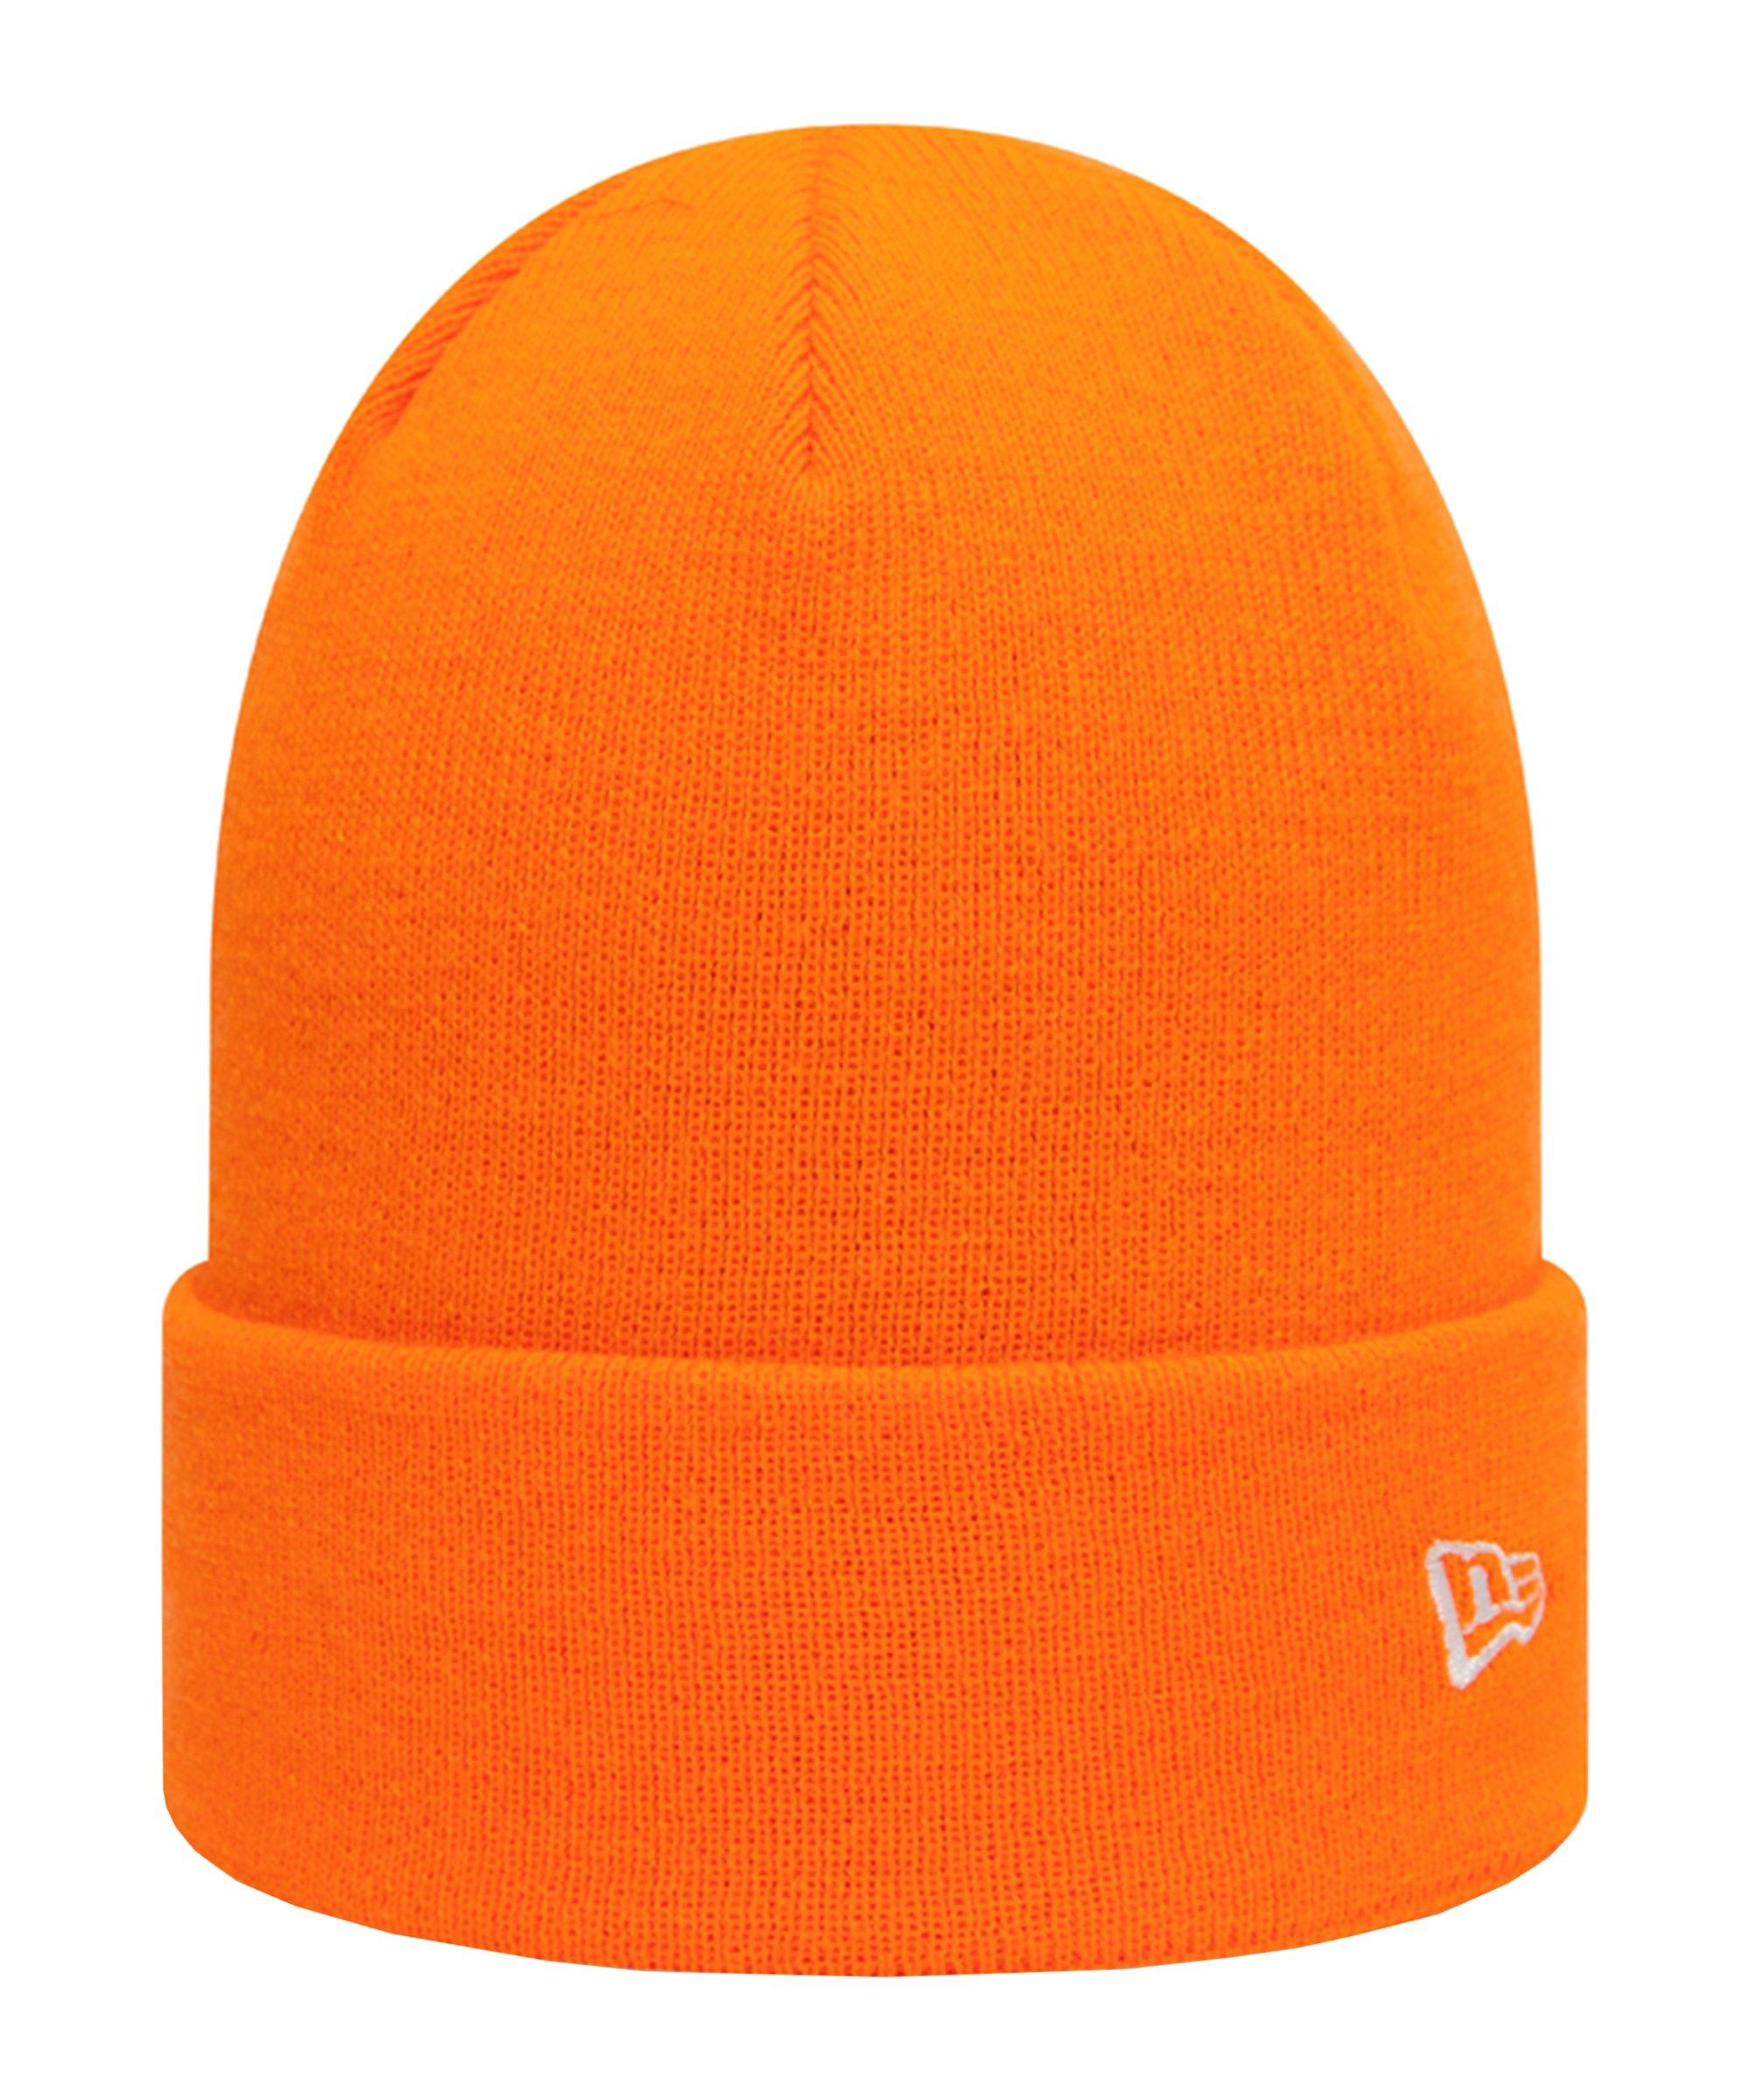 New Era Pop Cuff Knit Short Mütze FHFO - orange